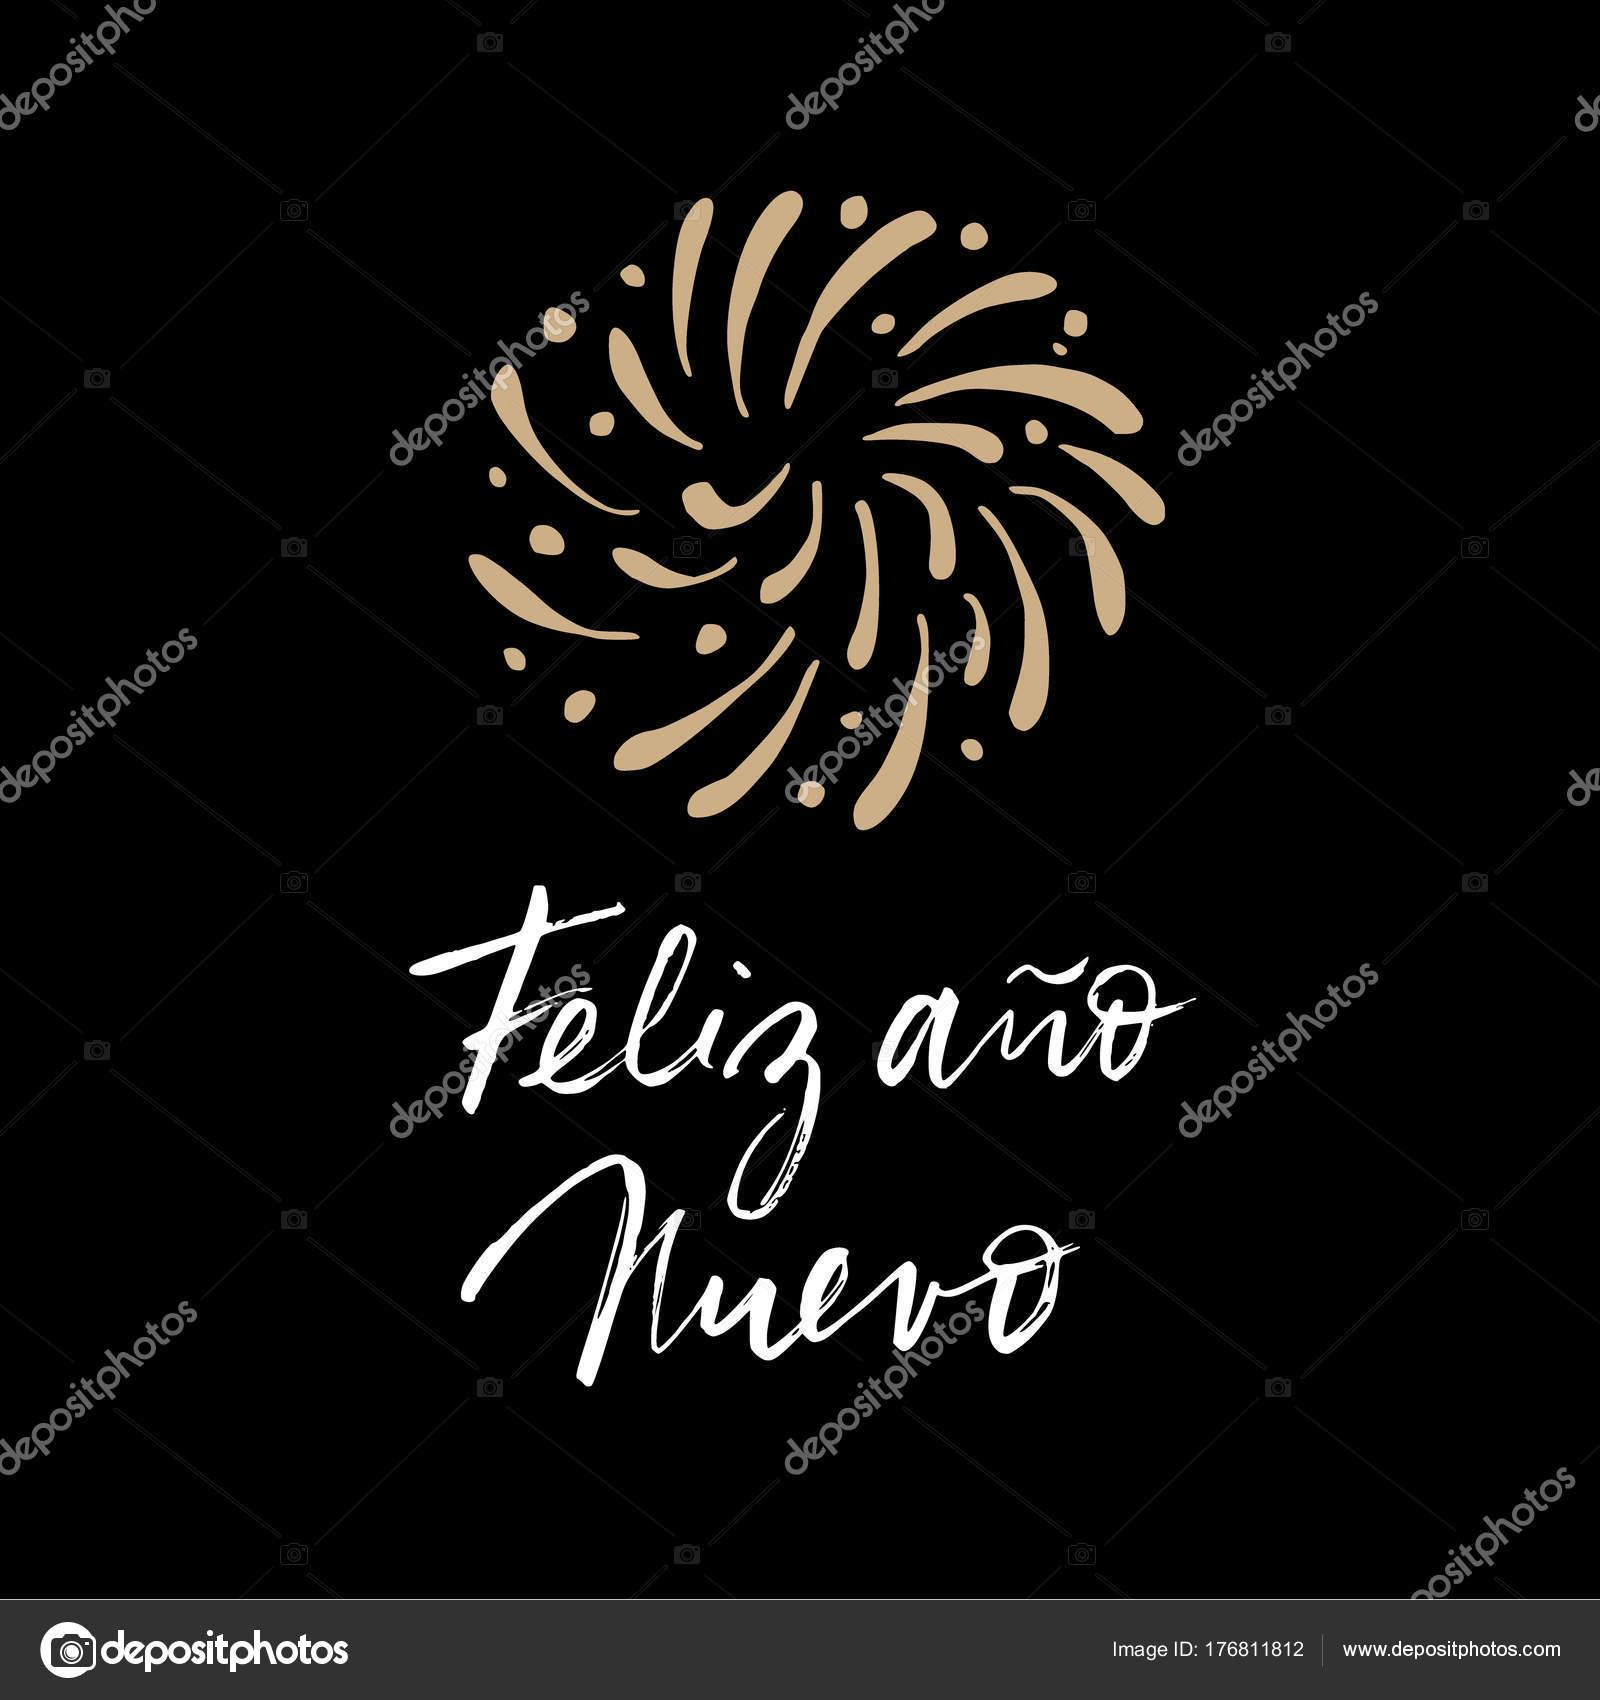 Feliz Ano Nuevo Spanish Happy New Year Greeting Card With